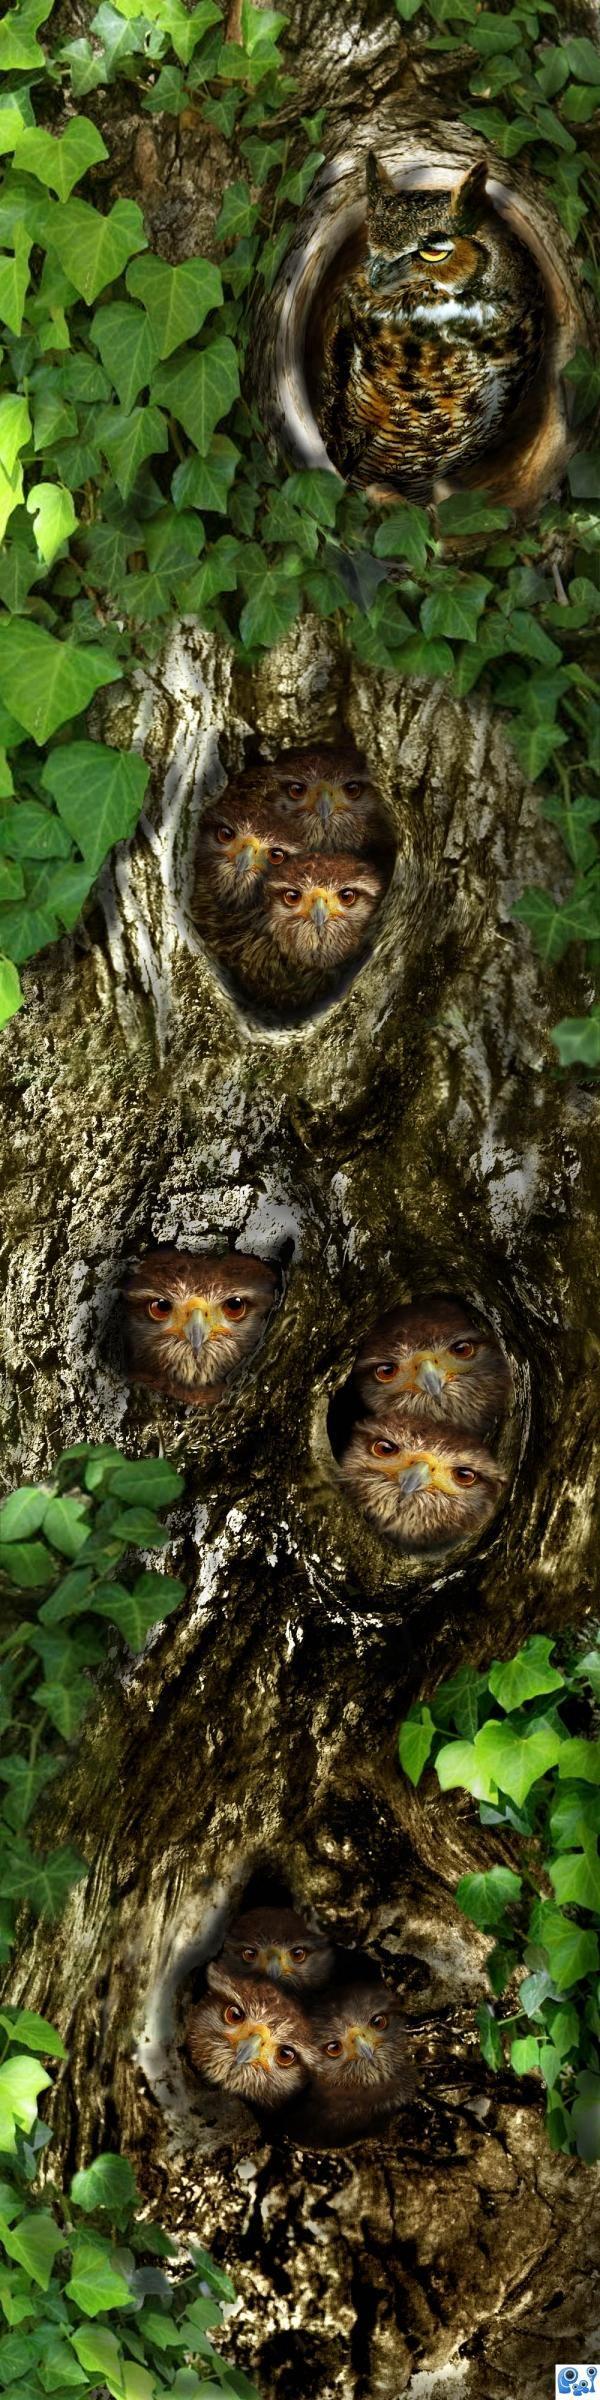 Multiplex pour hibou ayant une famille nombreuse. / Multiplex for a great horned owl family.